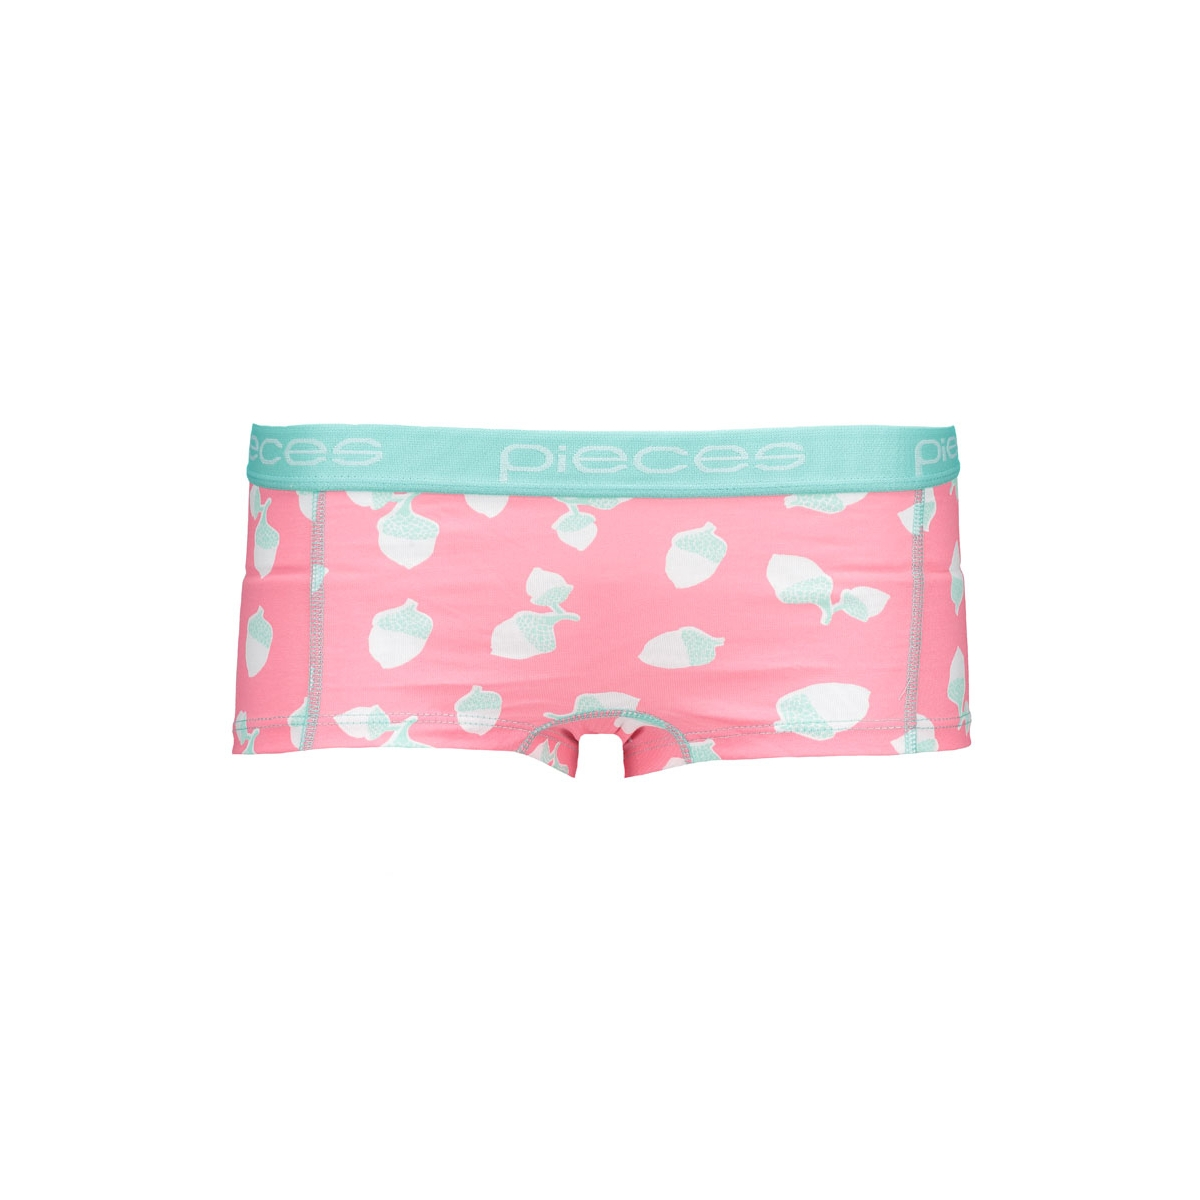 pclogo lady boxers 14-168 fun 17078170 pieces ondergoed pink lemonade/comb 1